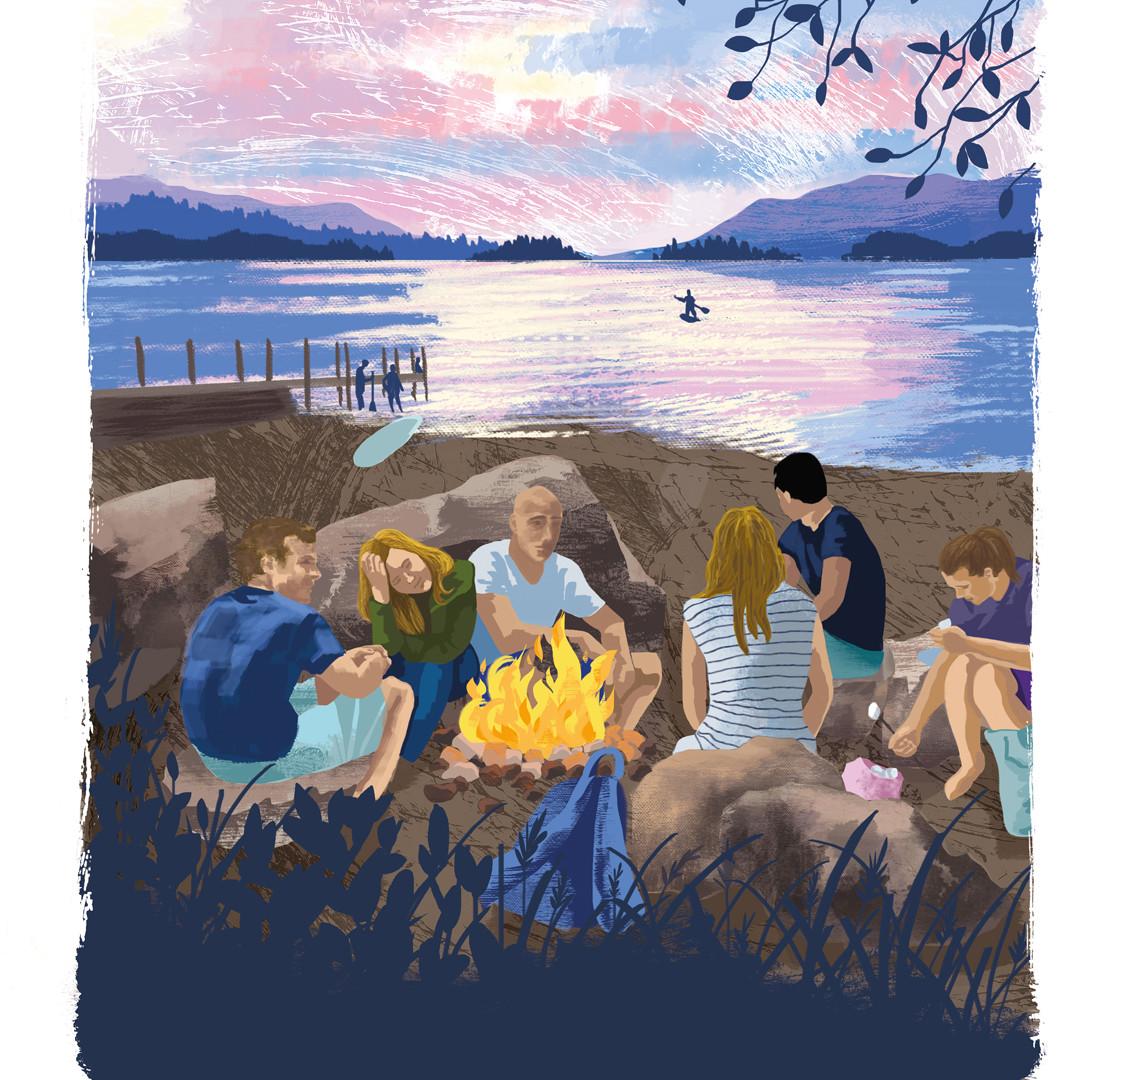 Ashness Pier Derwent Water, the Lake District National Park, digital illustration print, campire, wildcamping, summer adventures, summer sunset, Jenny Daymond Design and illustration